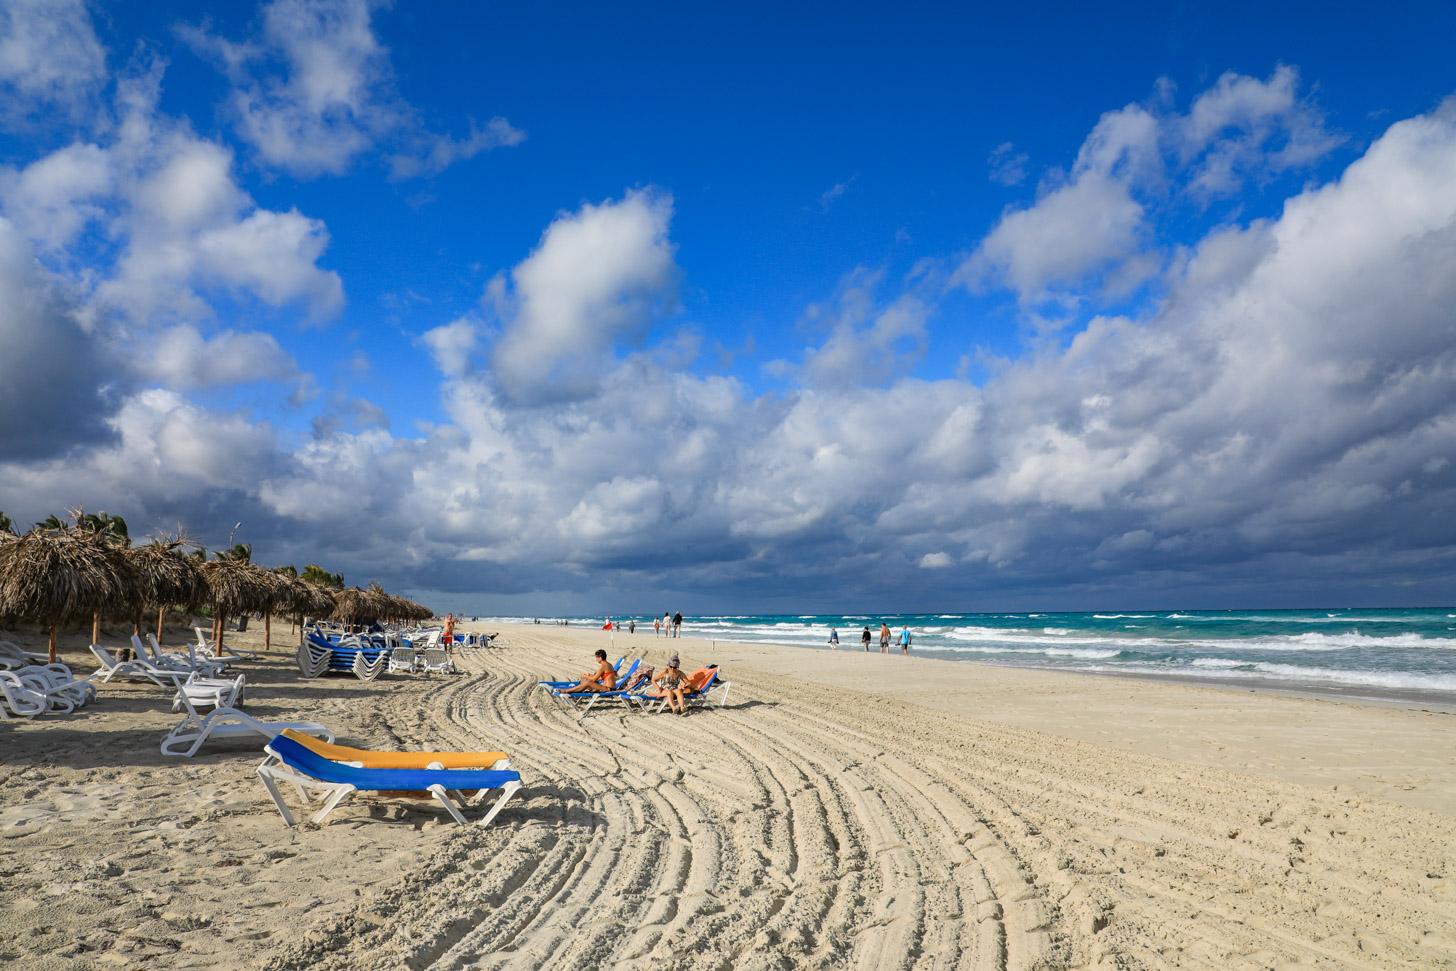 Cuba als winterzonbestemming